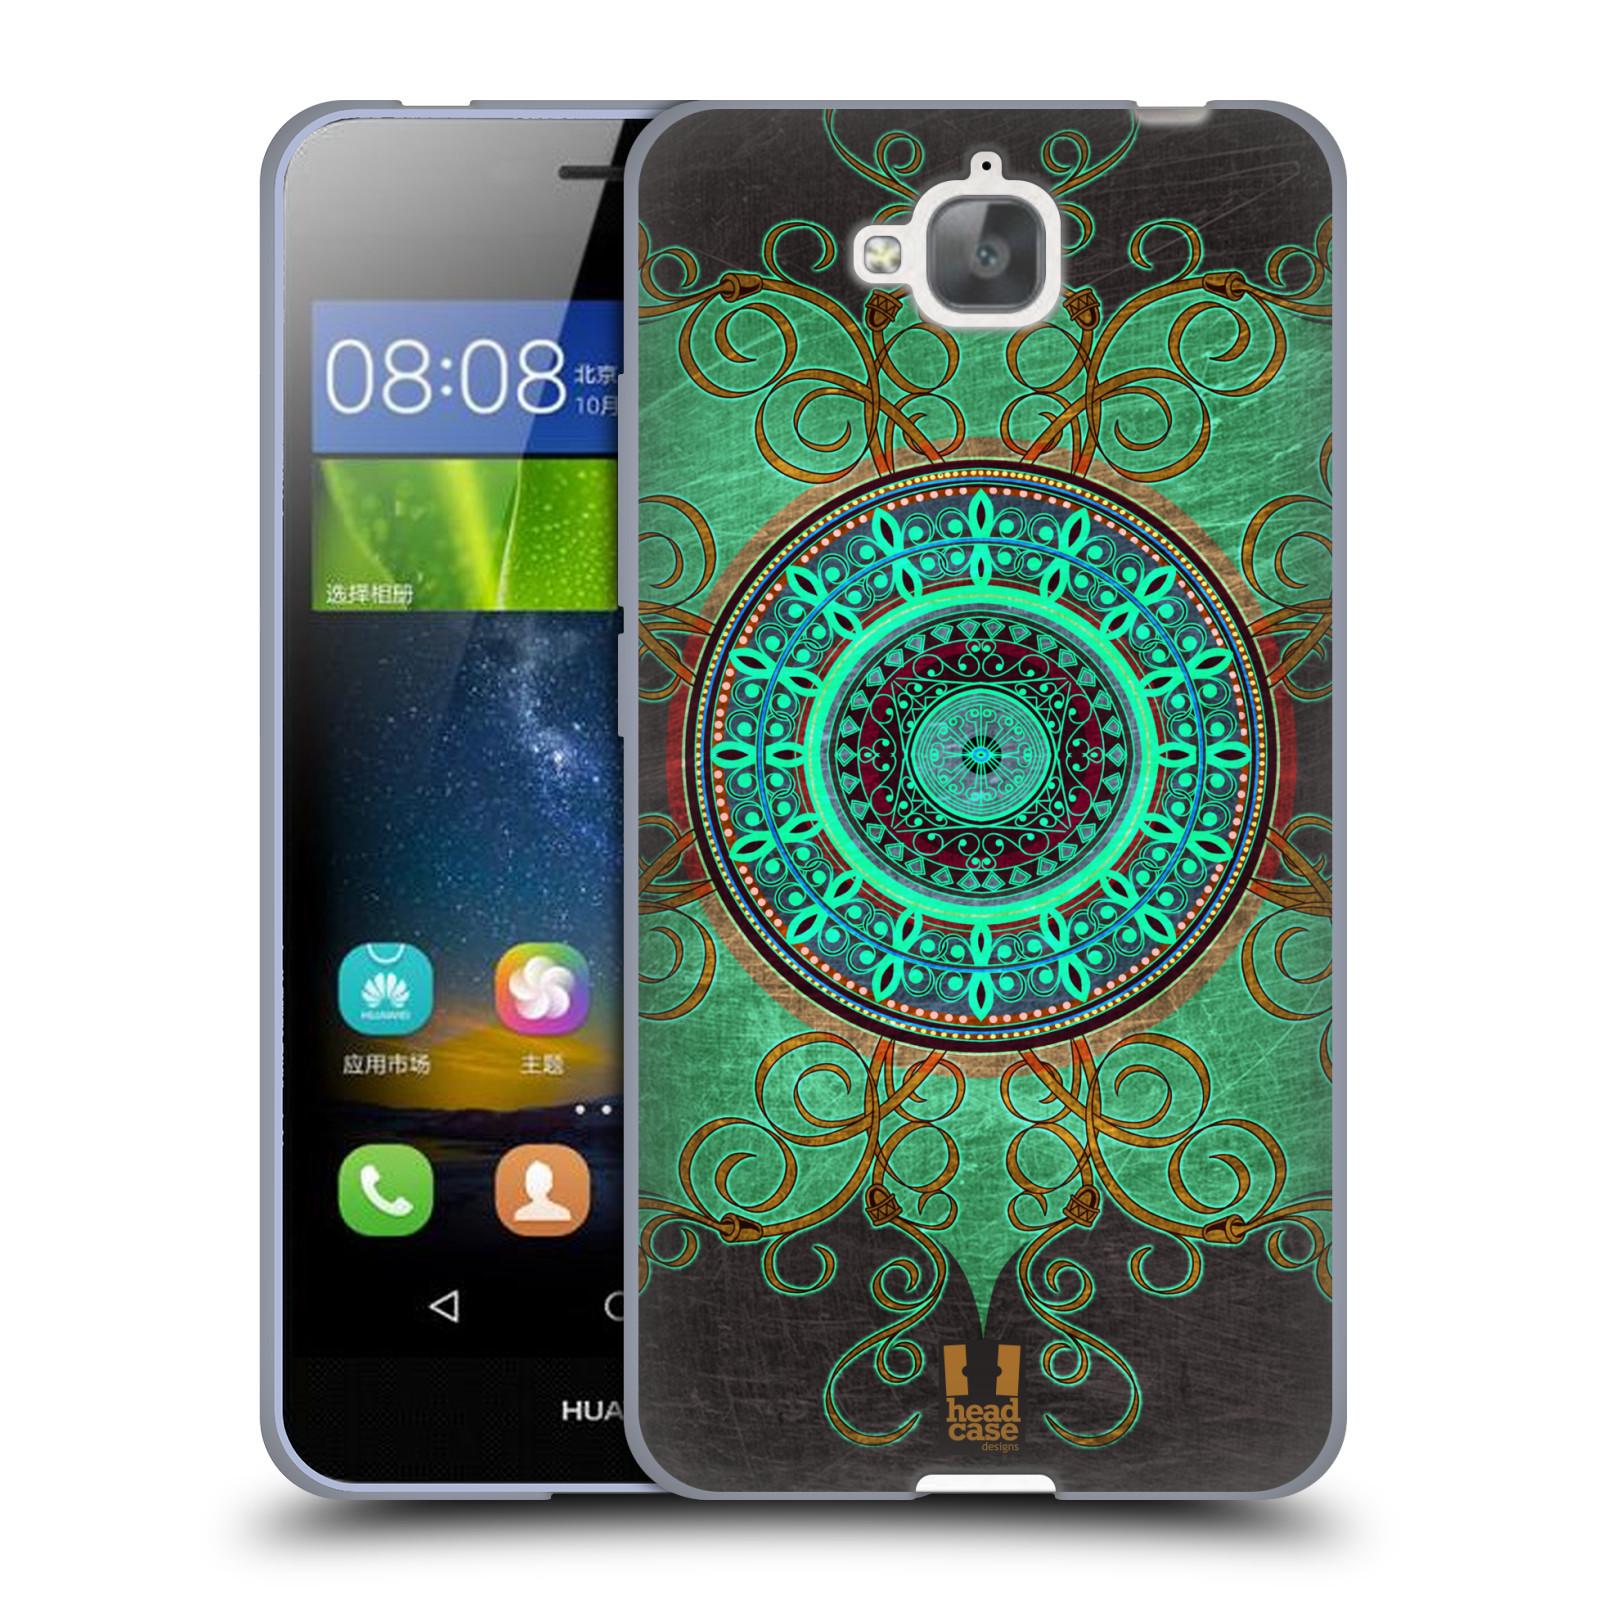 Silikonové pouzdro na mobil Huawei Y6 Pro Dual Sim HEAD CASE ARAB MANDALA